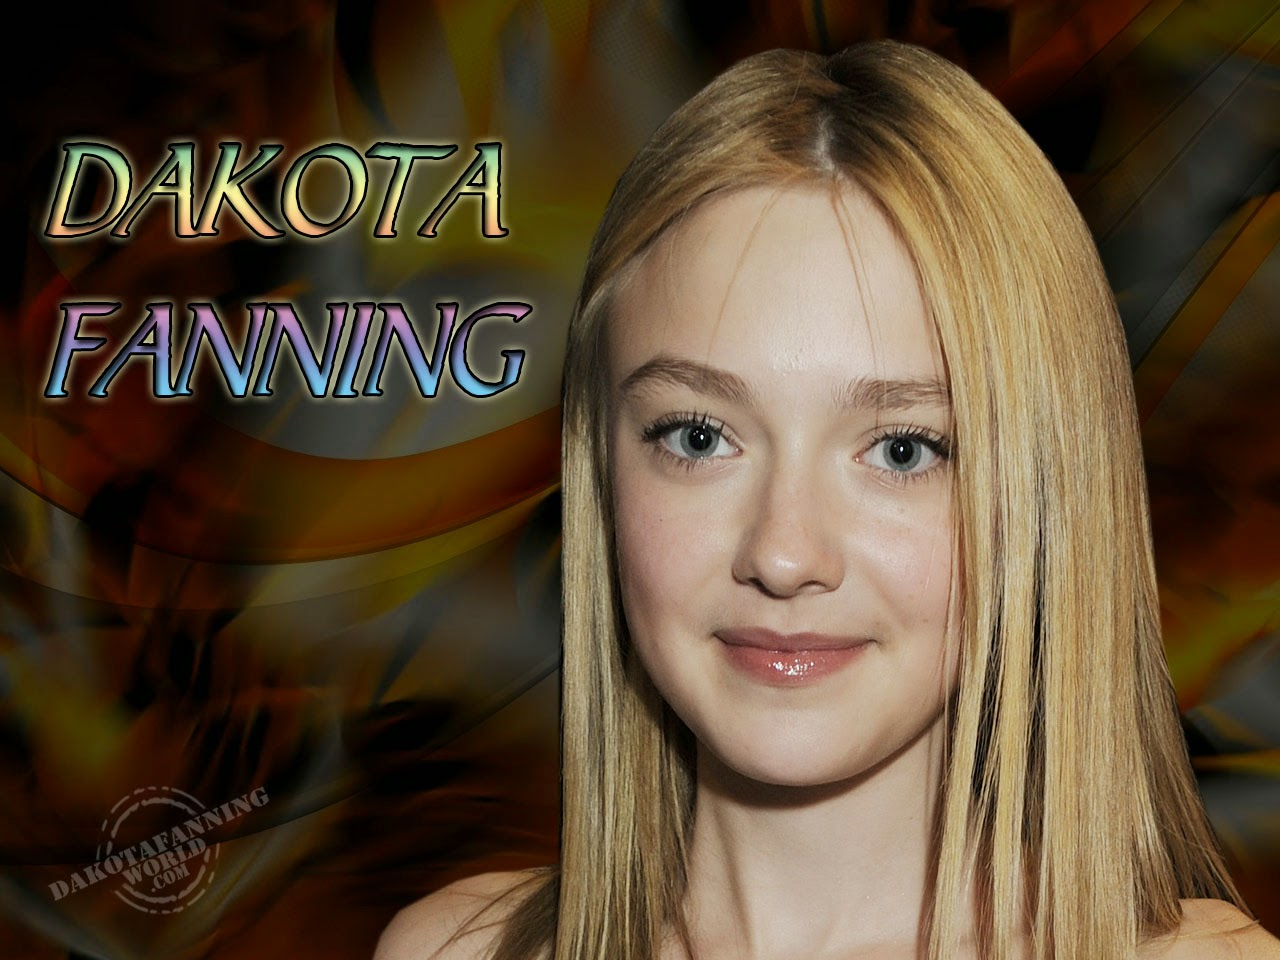 STARS HOLLYWOOD BOLLYWOOD WALLPAPER PICS: Dakota Fanning